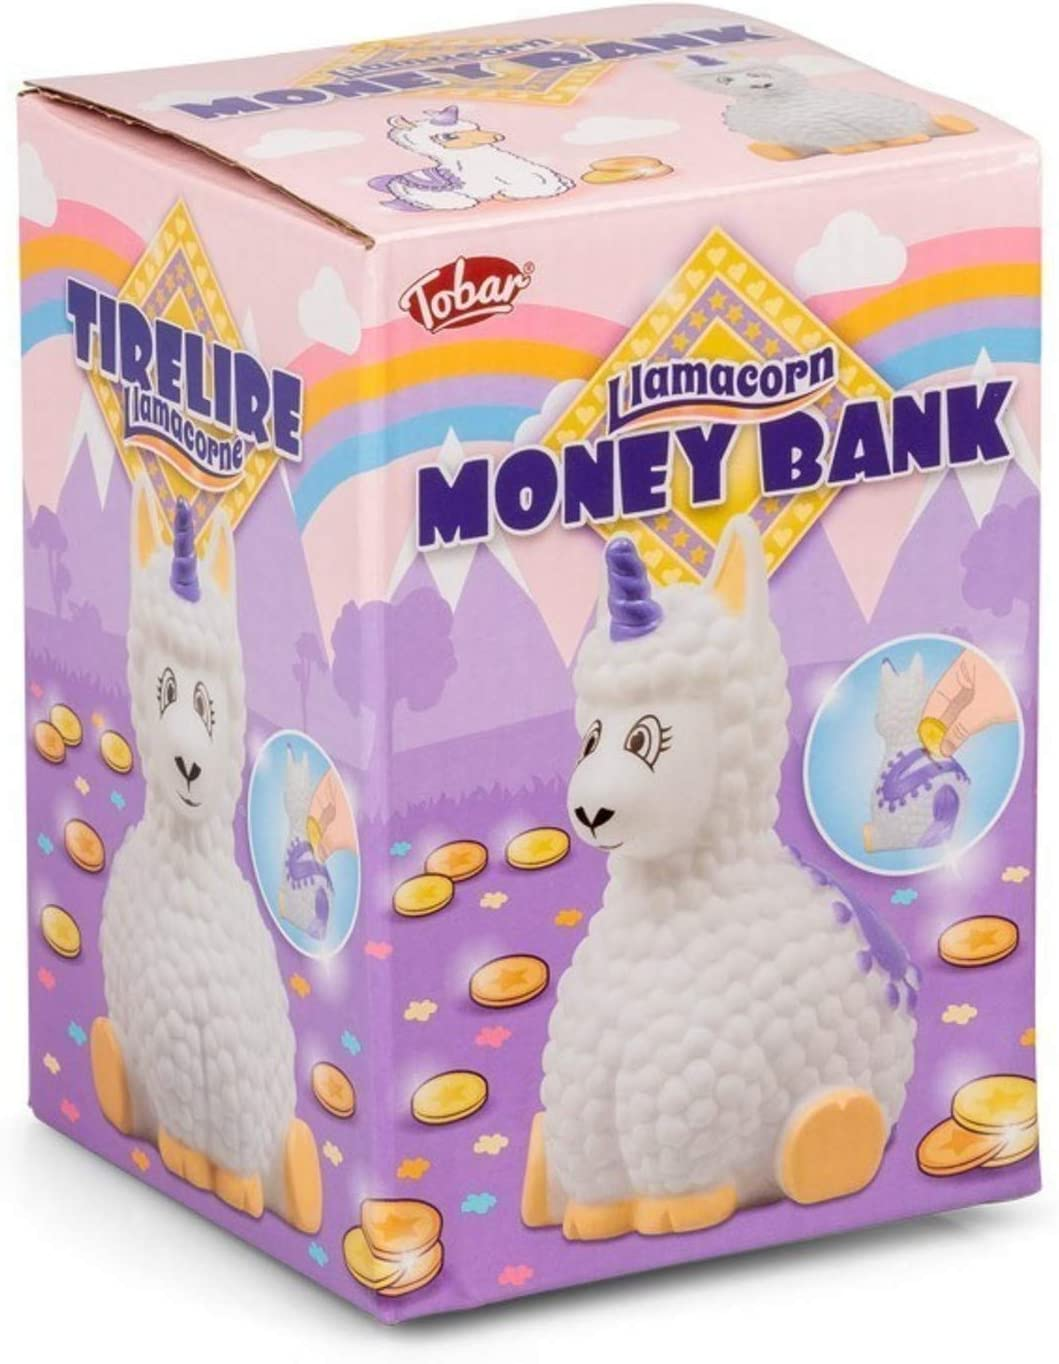 Tobar 35725 Llamacorn Money Bank